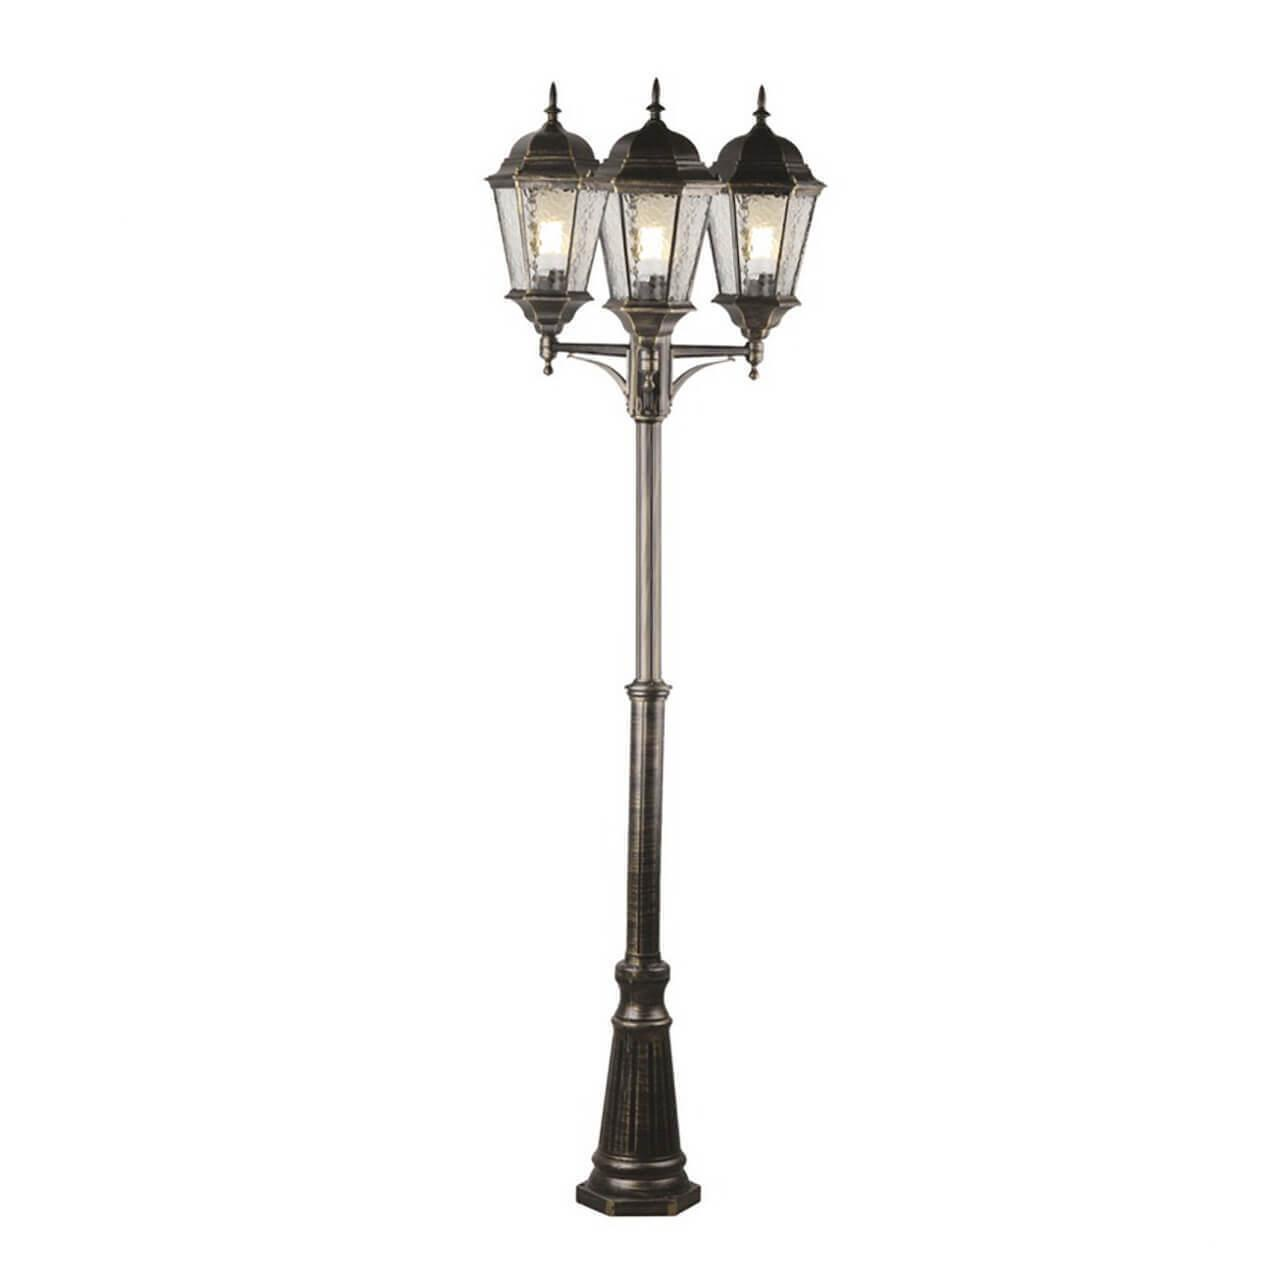 Садово-парковый светильник Arte Lamp Genova A1207PA-3BN садово парковый светильник arte lamp berlin a1017pa 1wg